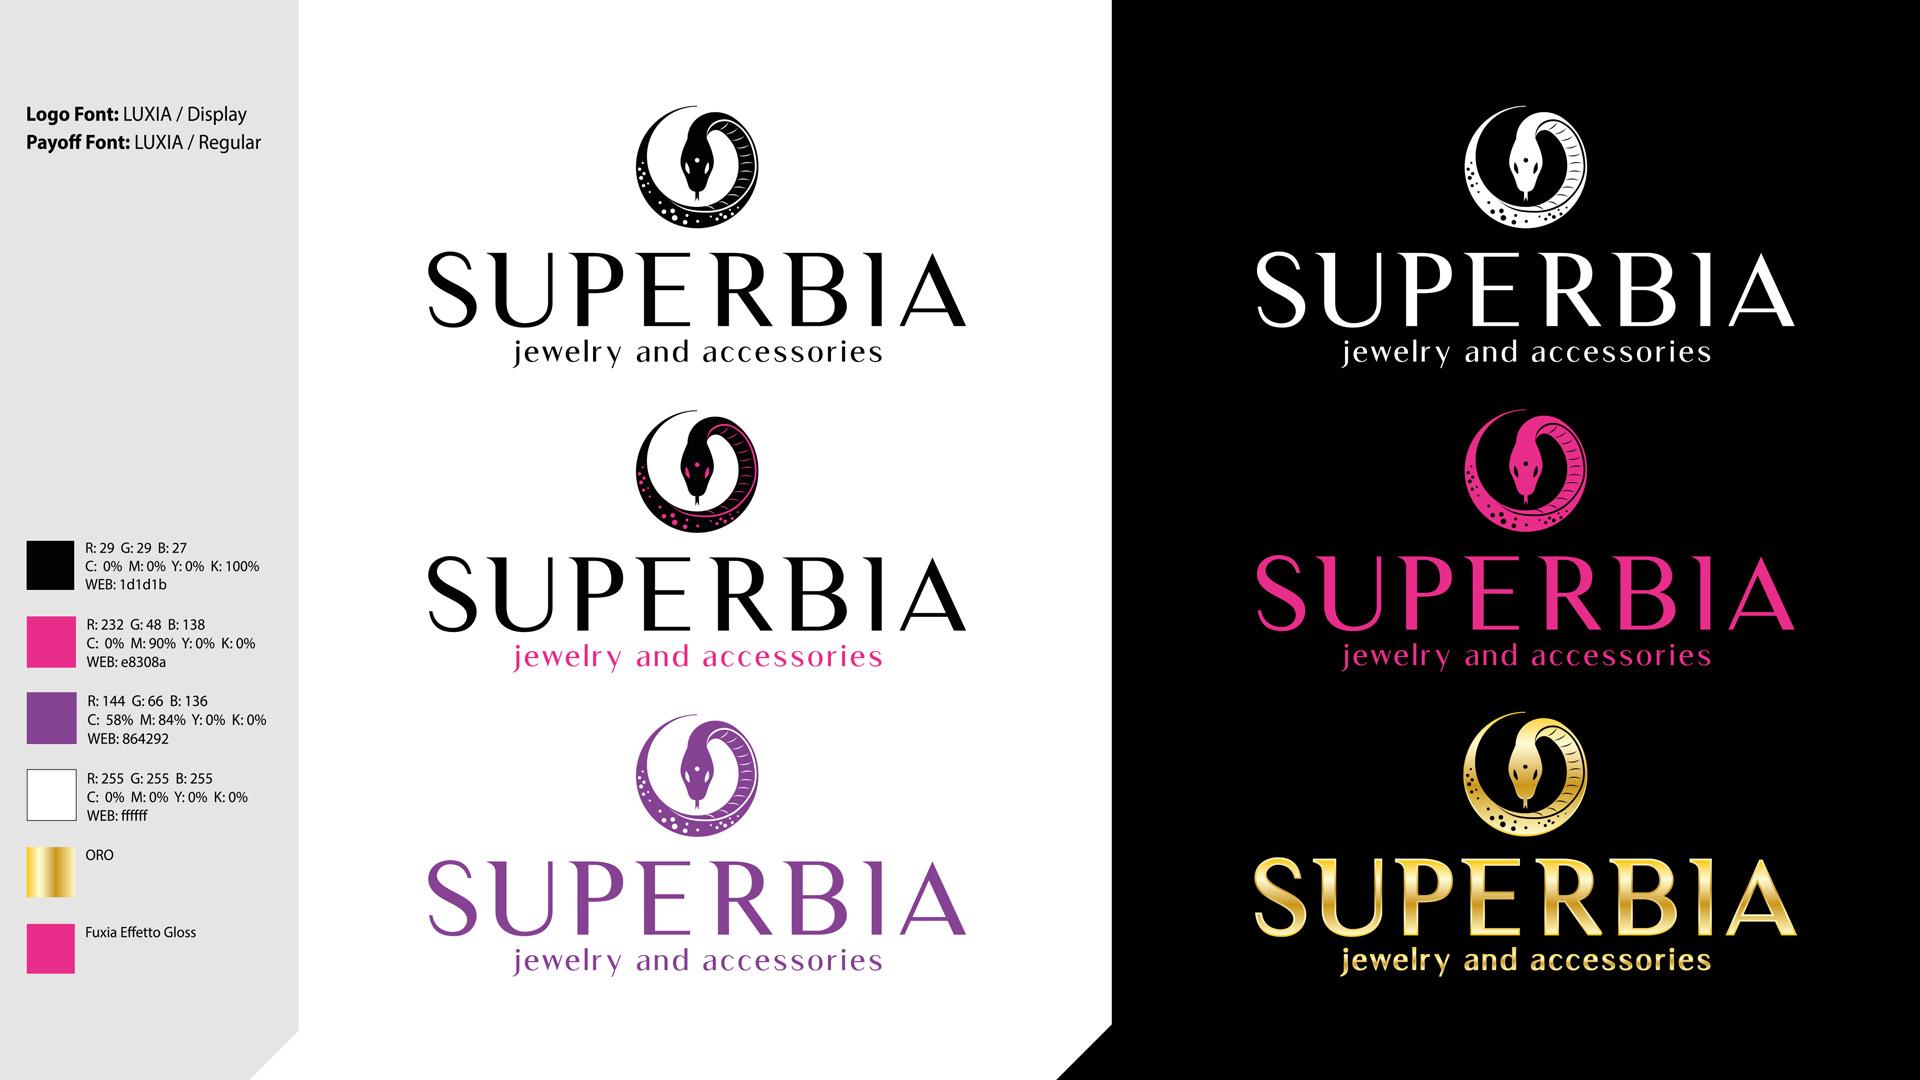 Superbia logotipo 00